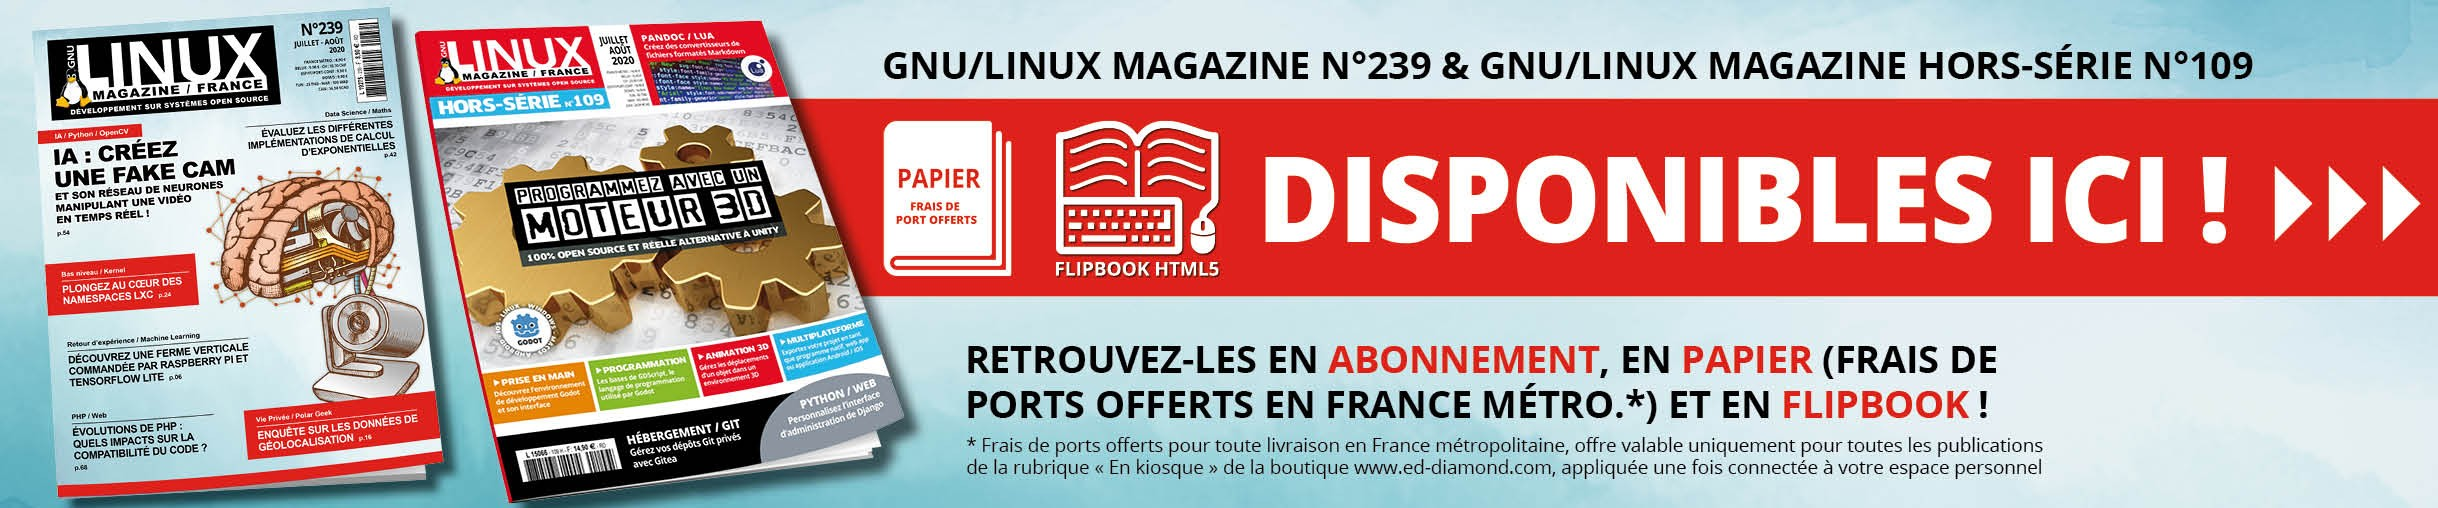 GNU/Linux Magazine 239 et son Hors-Série n°109